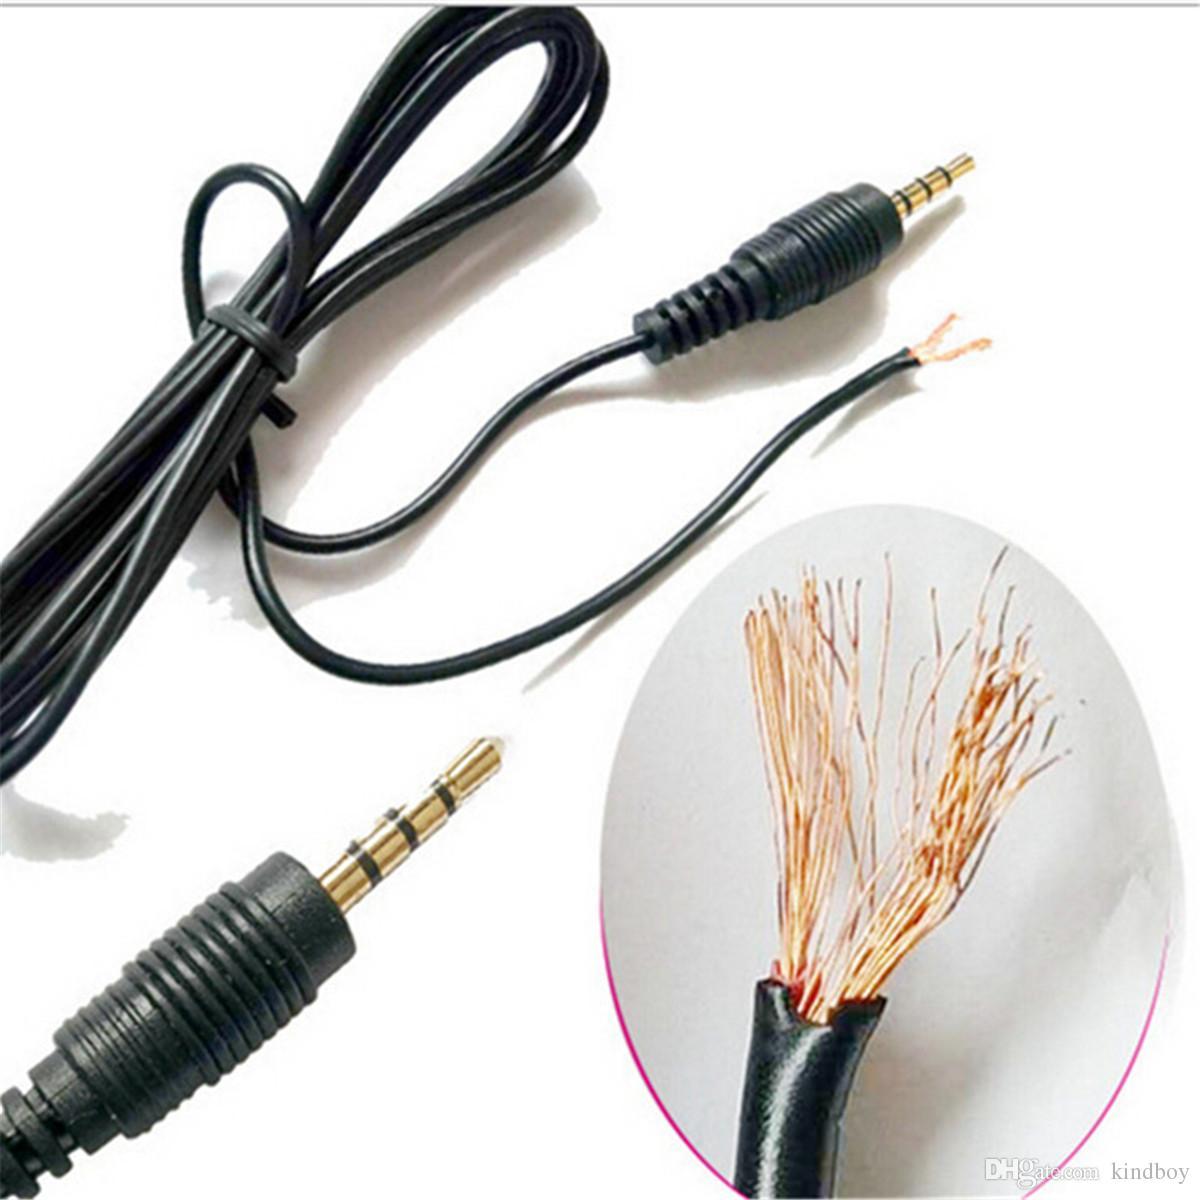 Portable Mini Clip-on Revers Lavalier Mikrofon 3,5 mm Klinke Freisprecheinrichtung Mini Wired Kondensatormikrofon für iPhone Samsung Smartphone